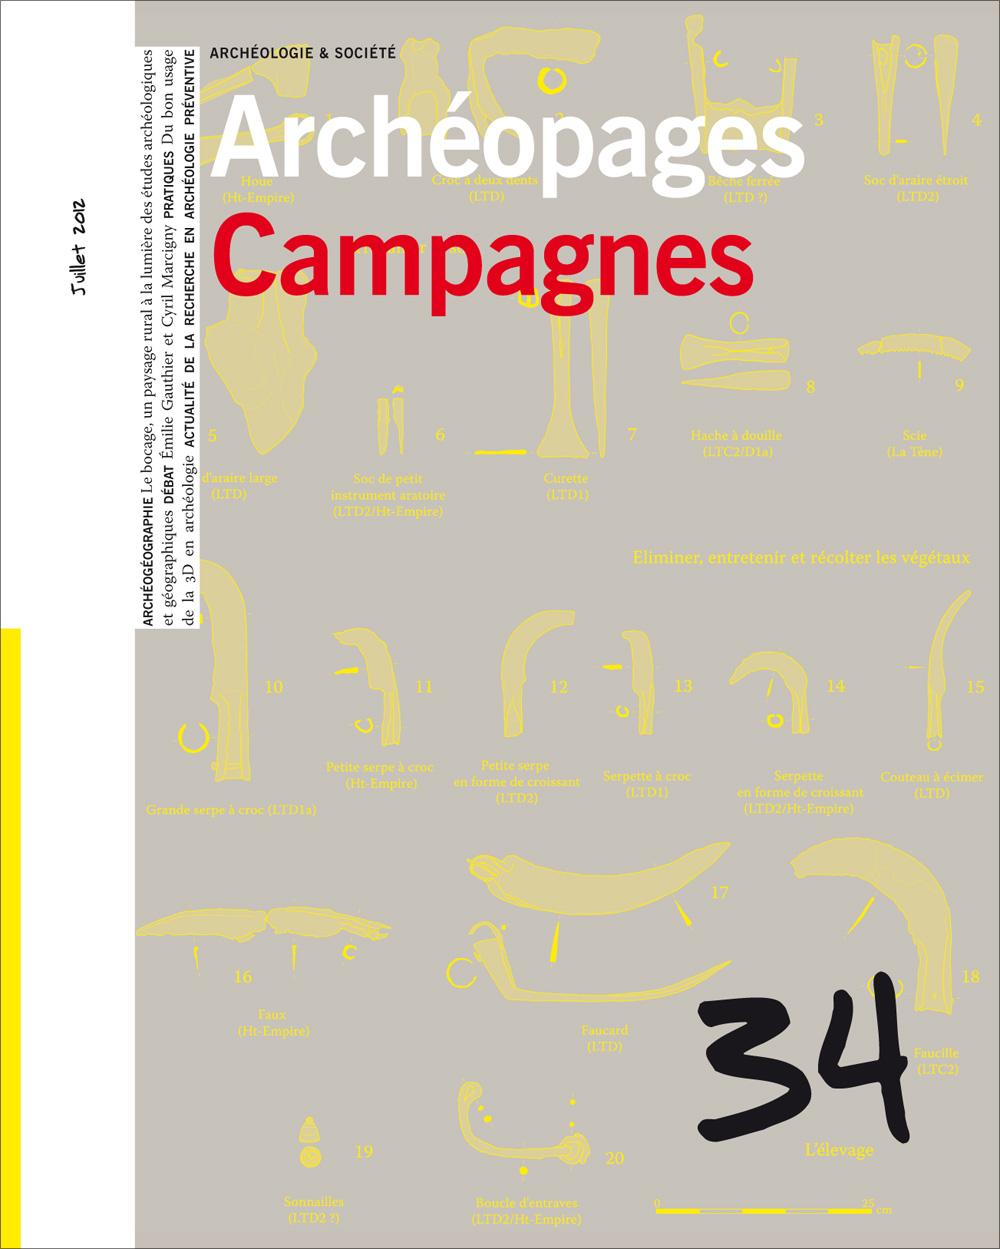 Archéopages 34 : Campagnes